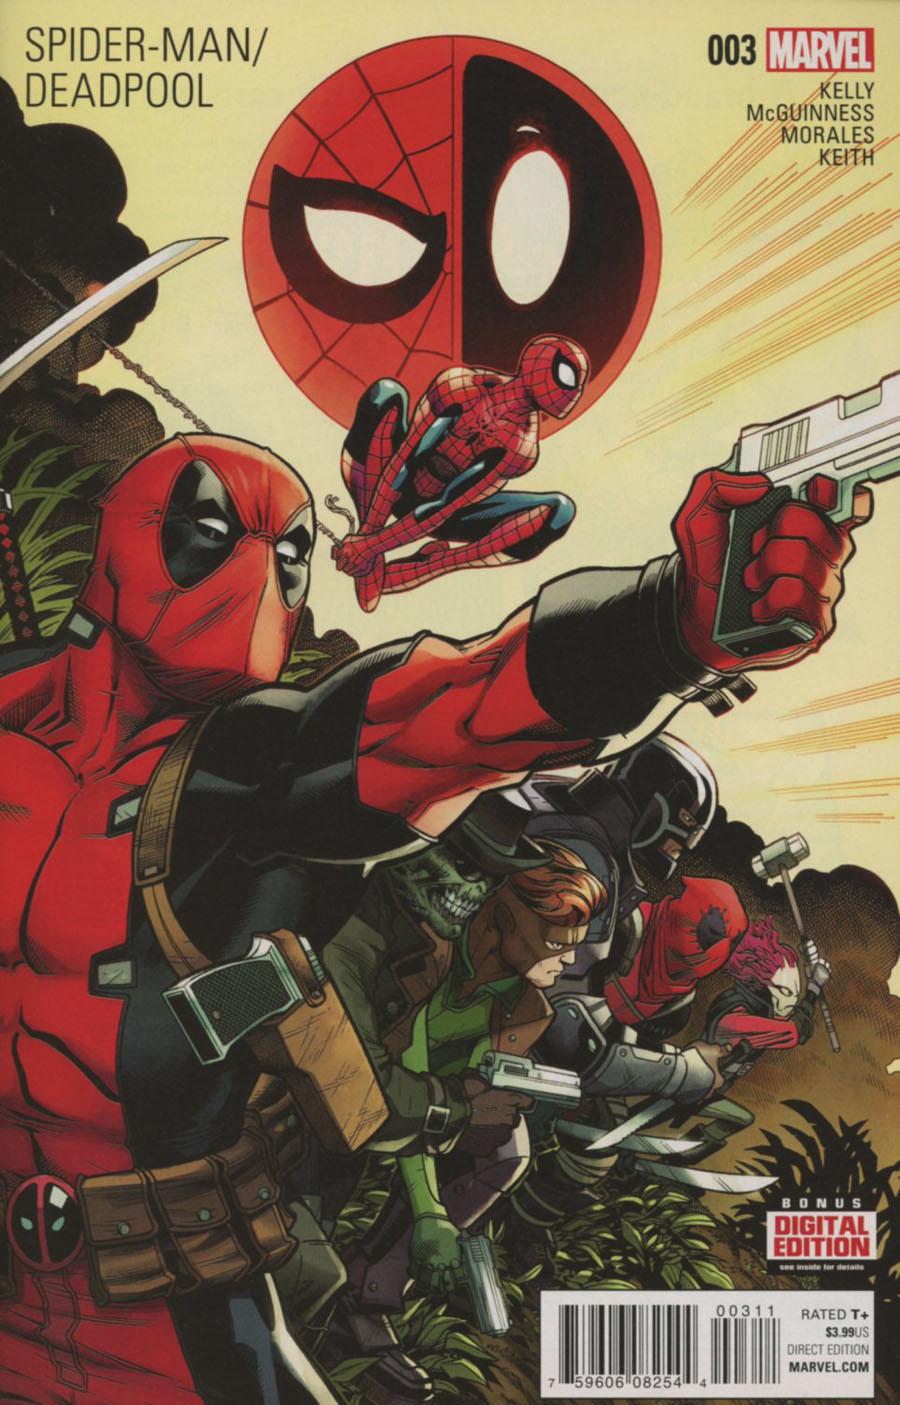 Spider-Man Deadpool #3 Cover A 1st Ptg Regular Ed McGuinness Cover